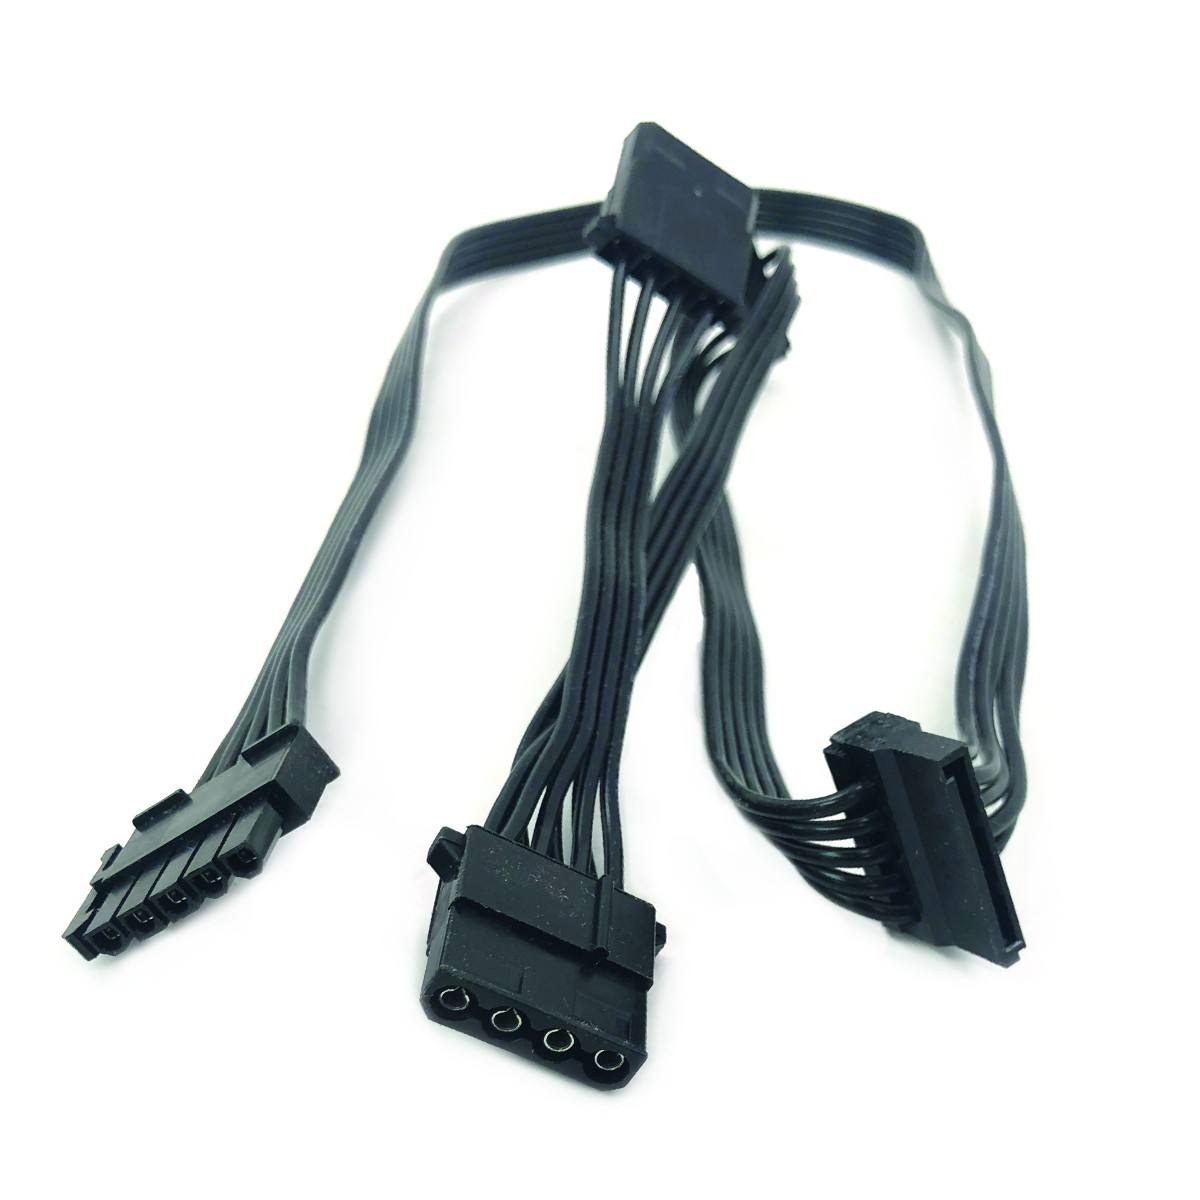 Modular Cable: 2 Molex, 2 SATA for PT-1000/PT-1200